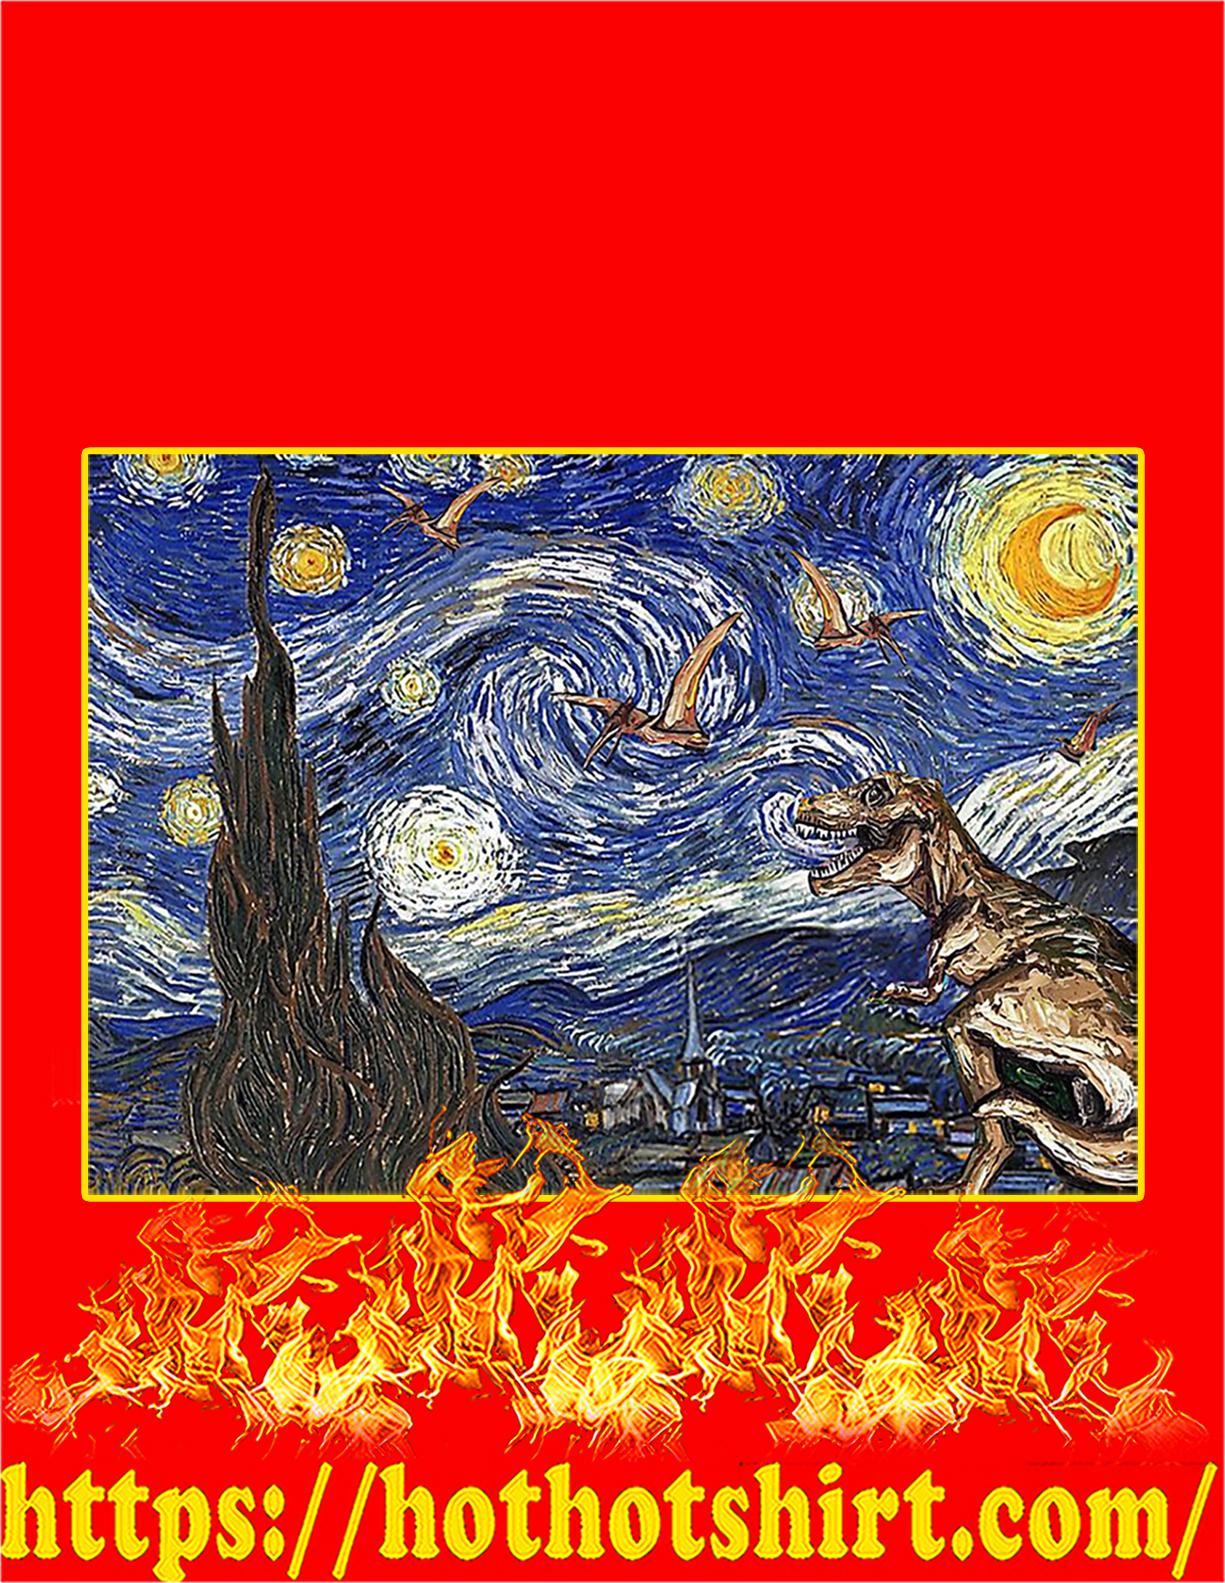 Starry night dinosaur poster - A4